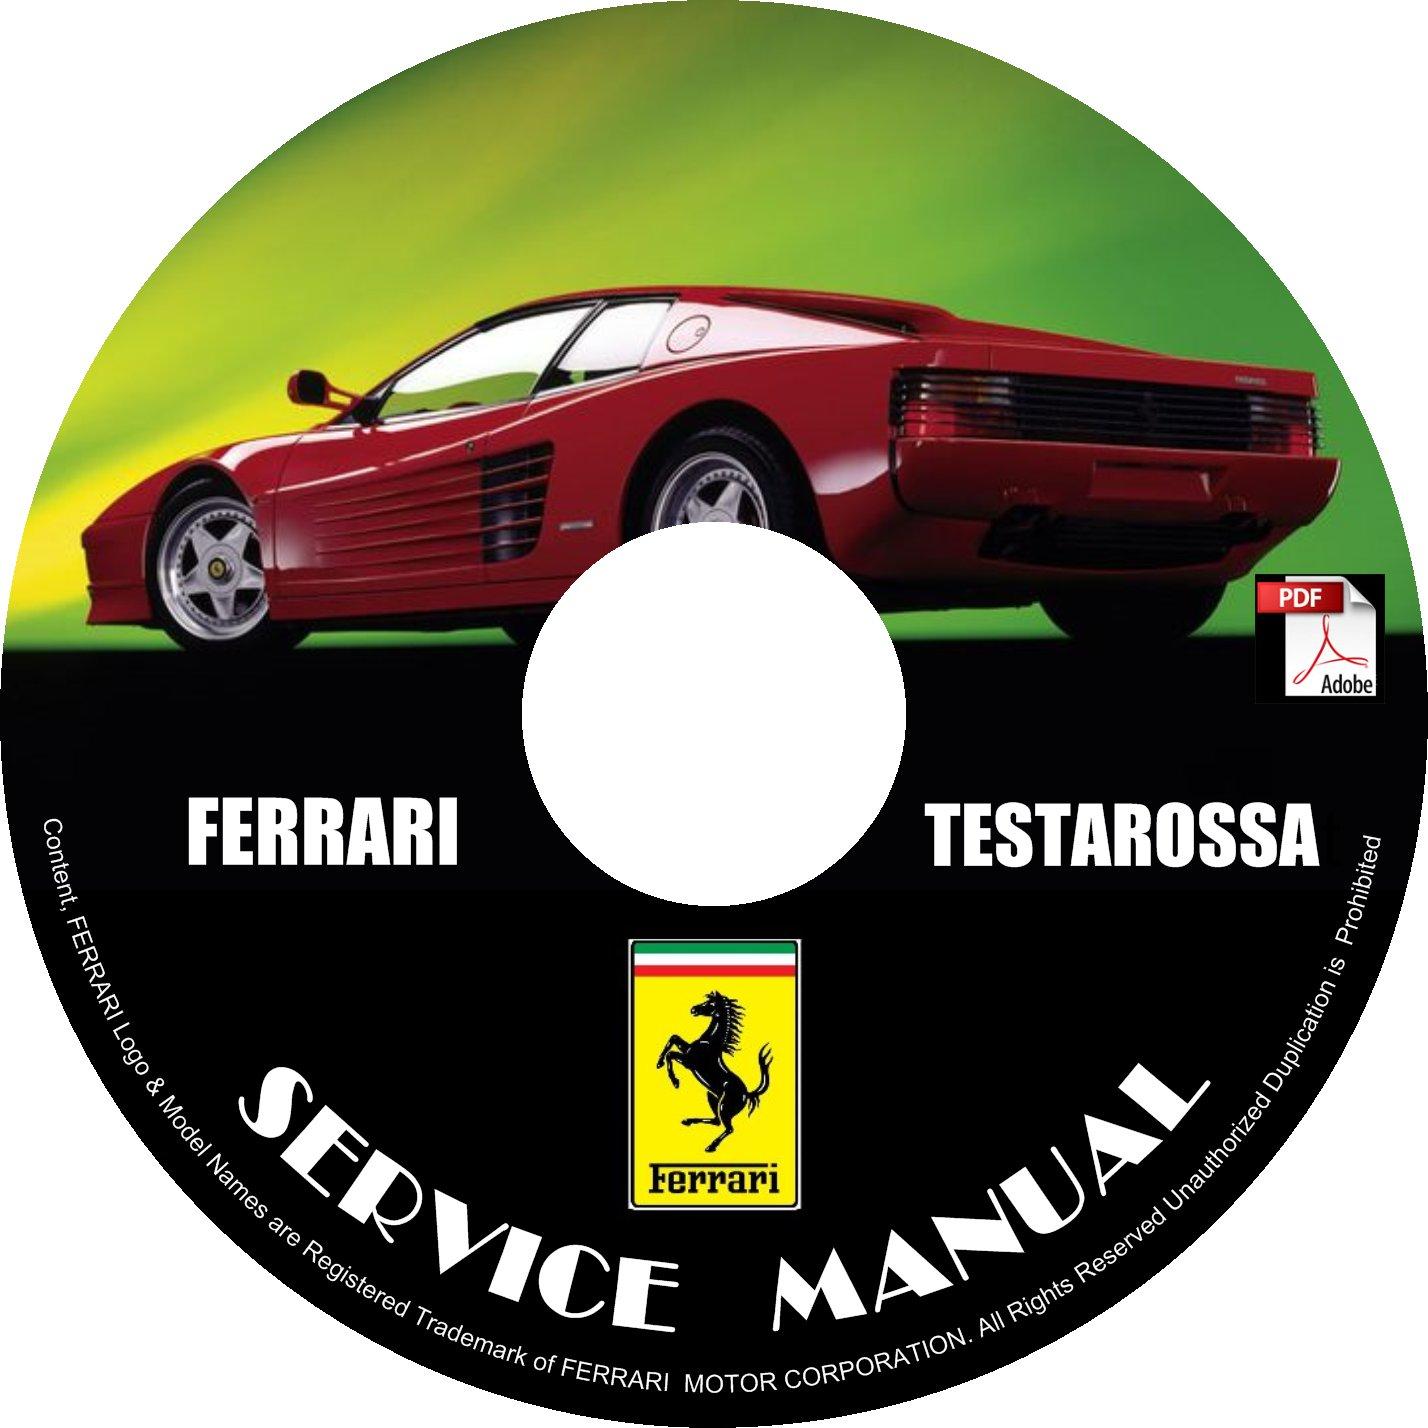 1988 Ferrari Testarossa Factory Service Repair Shop Manual on CD Fix Rebuilt